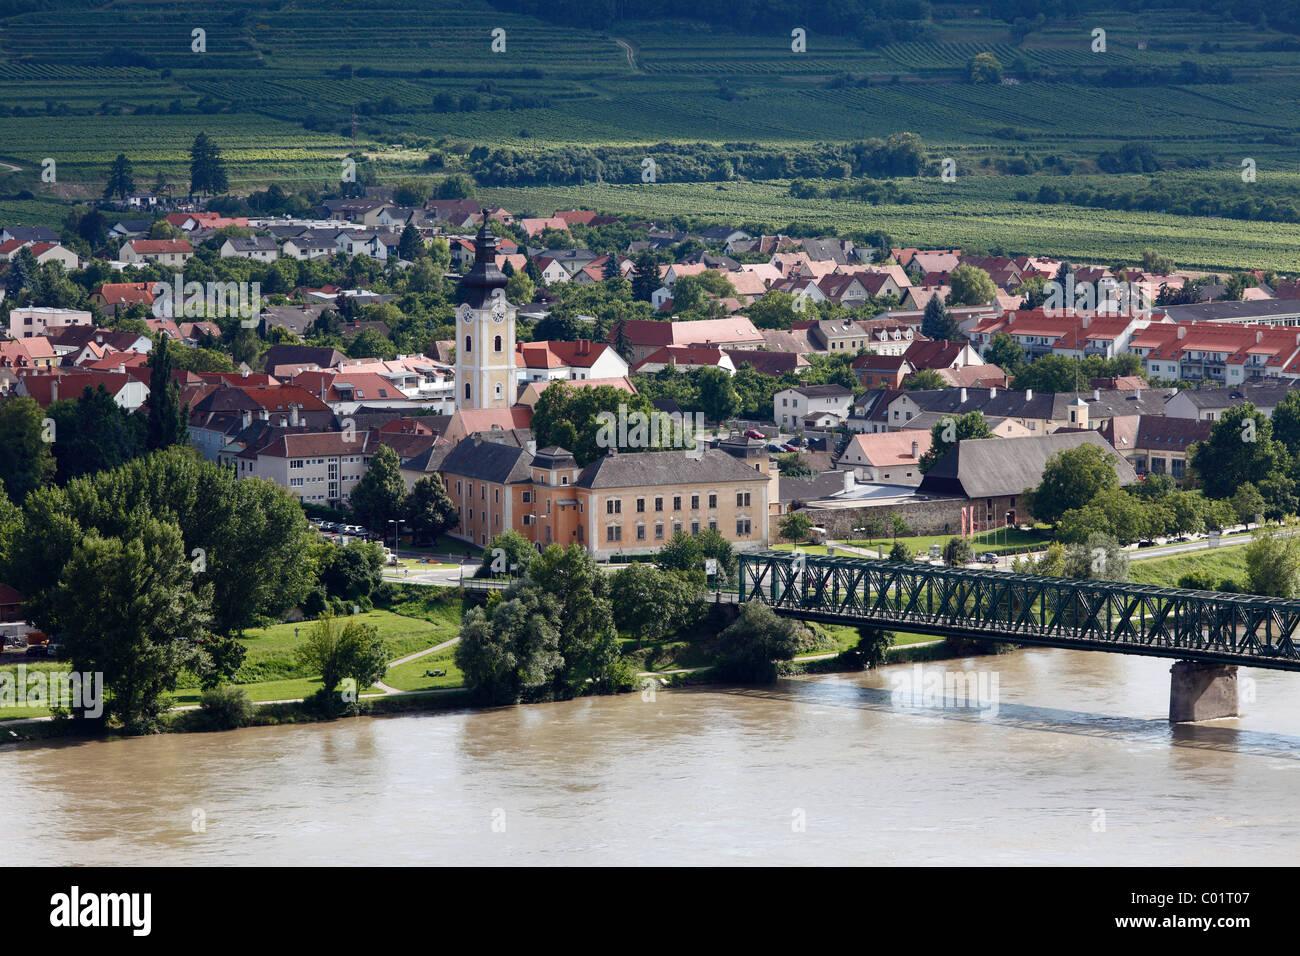 Austria Singles Dating Mautern An Der Donau, Sites Grodig